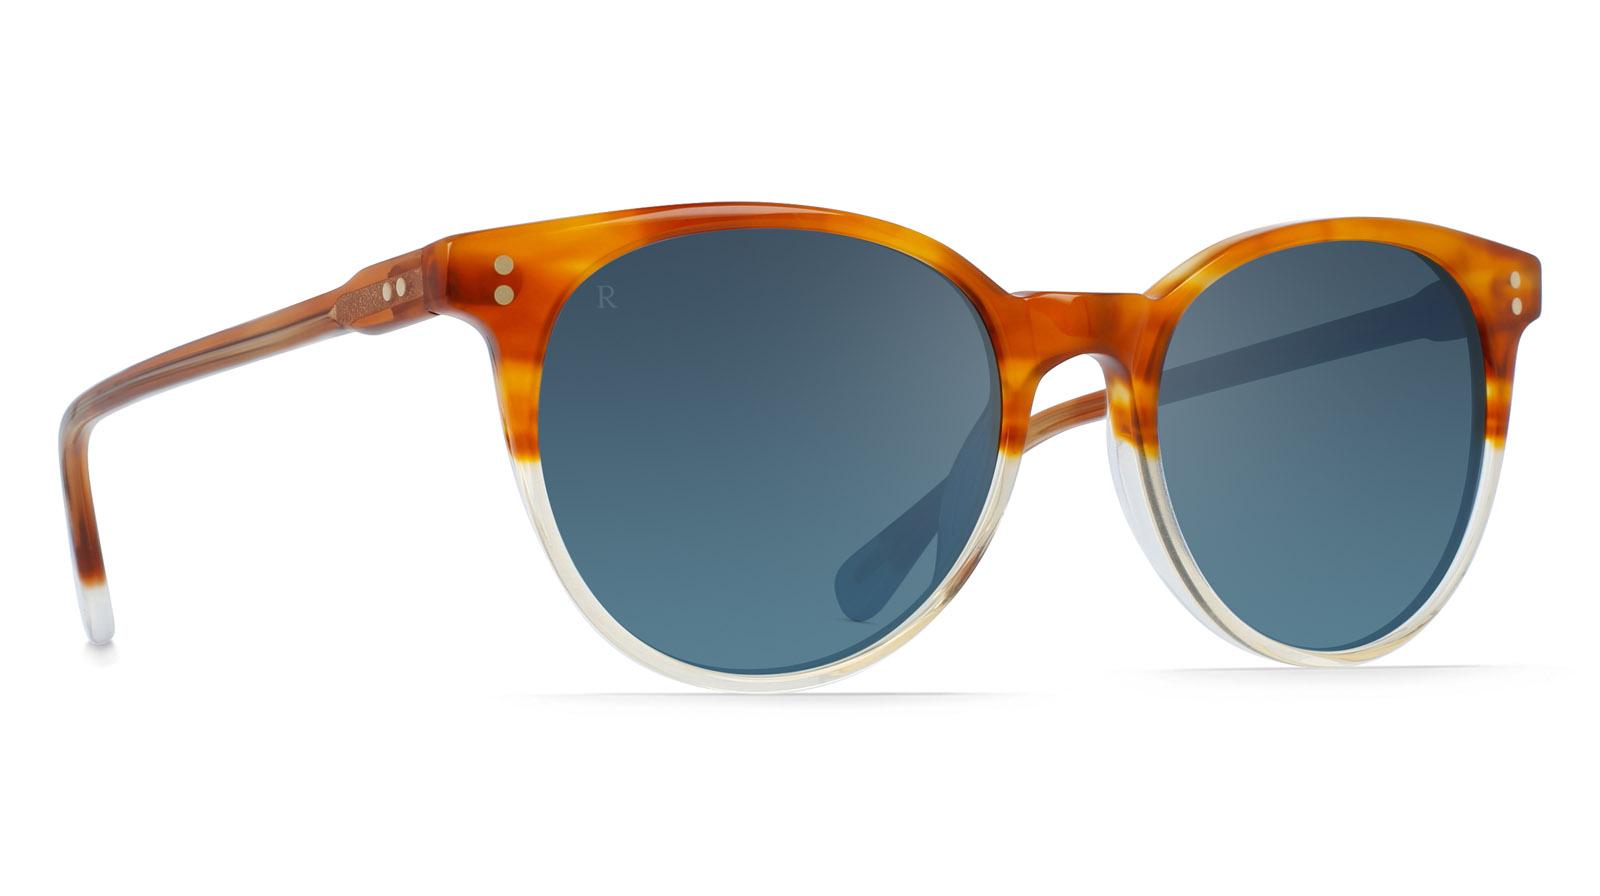 3c5c95b994 Raen Sunglasses SS18 Preview - Boardsport SOURCE